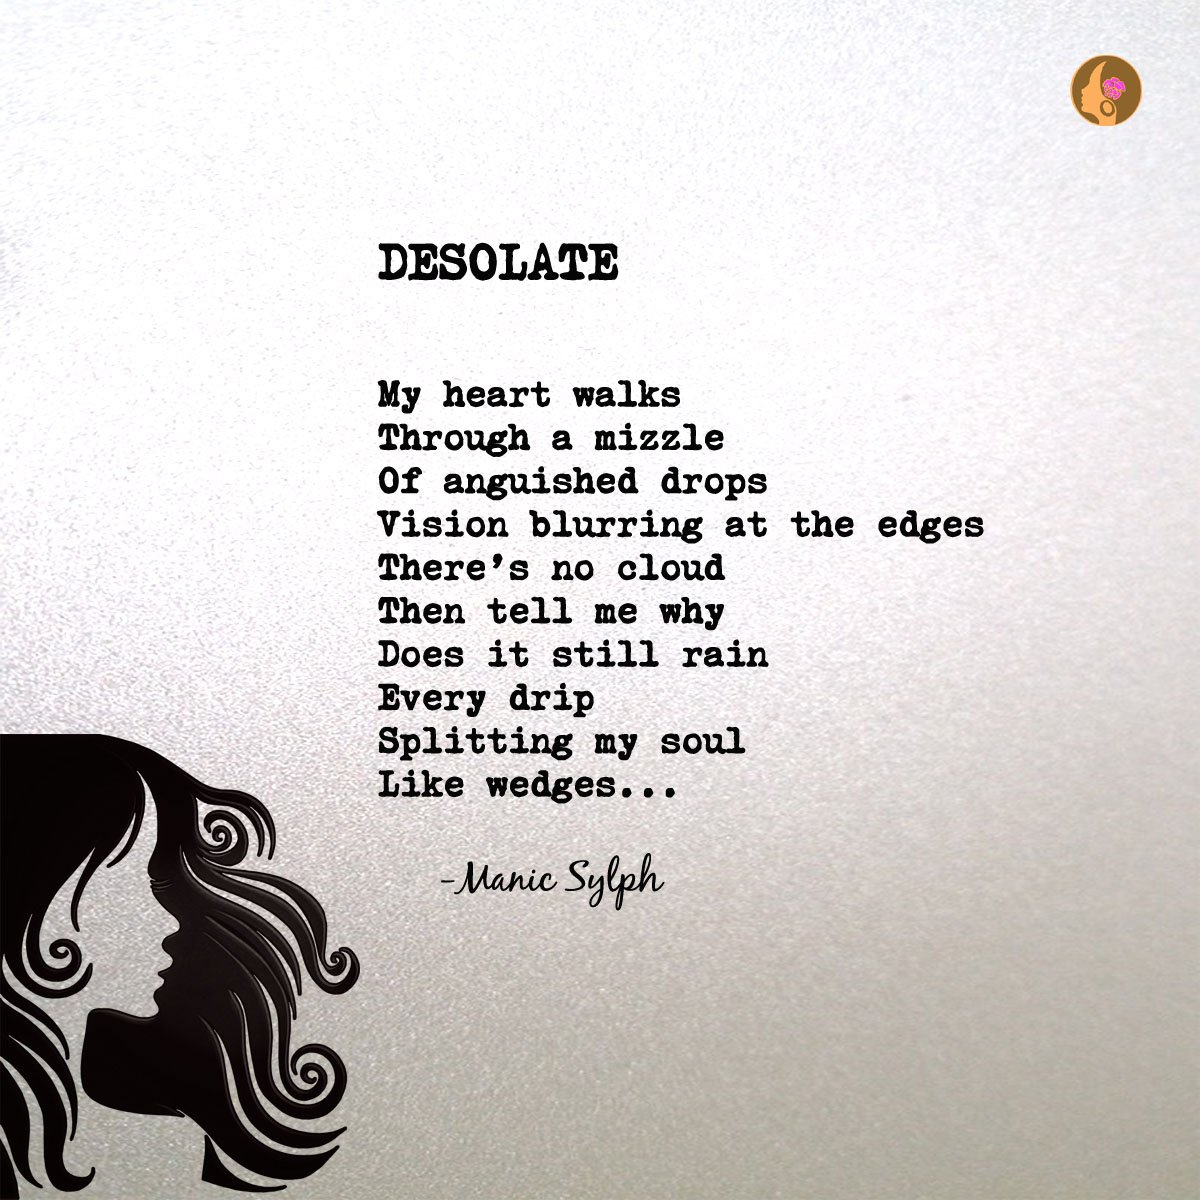 RT @manicsylph: DESOLATE  #poetry #poet #poets #poem #poems #love #life #manicsylph ht ...